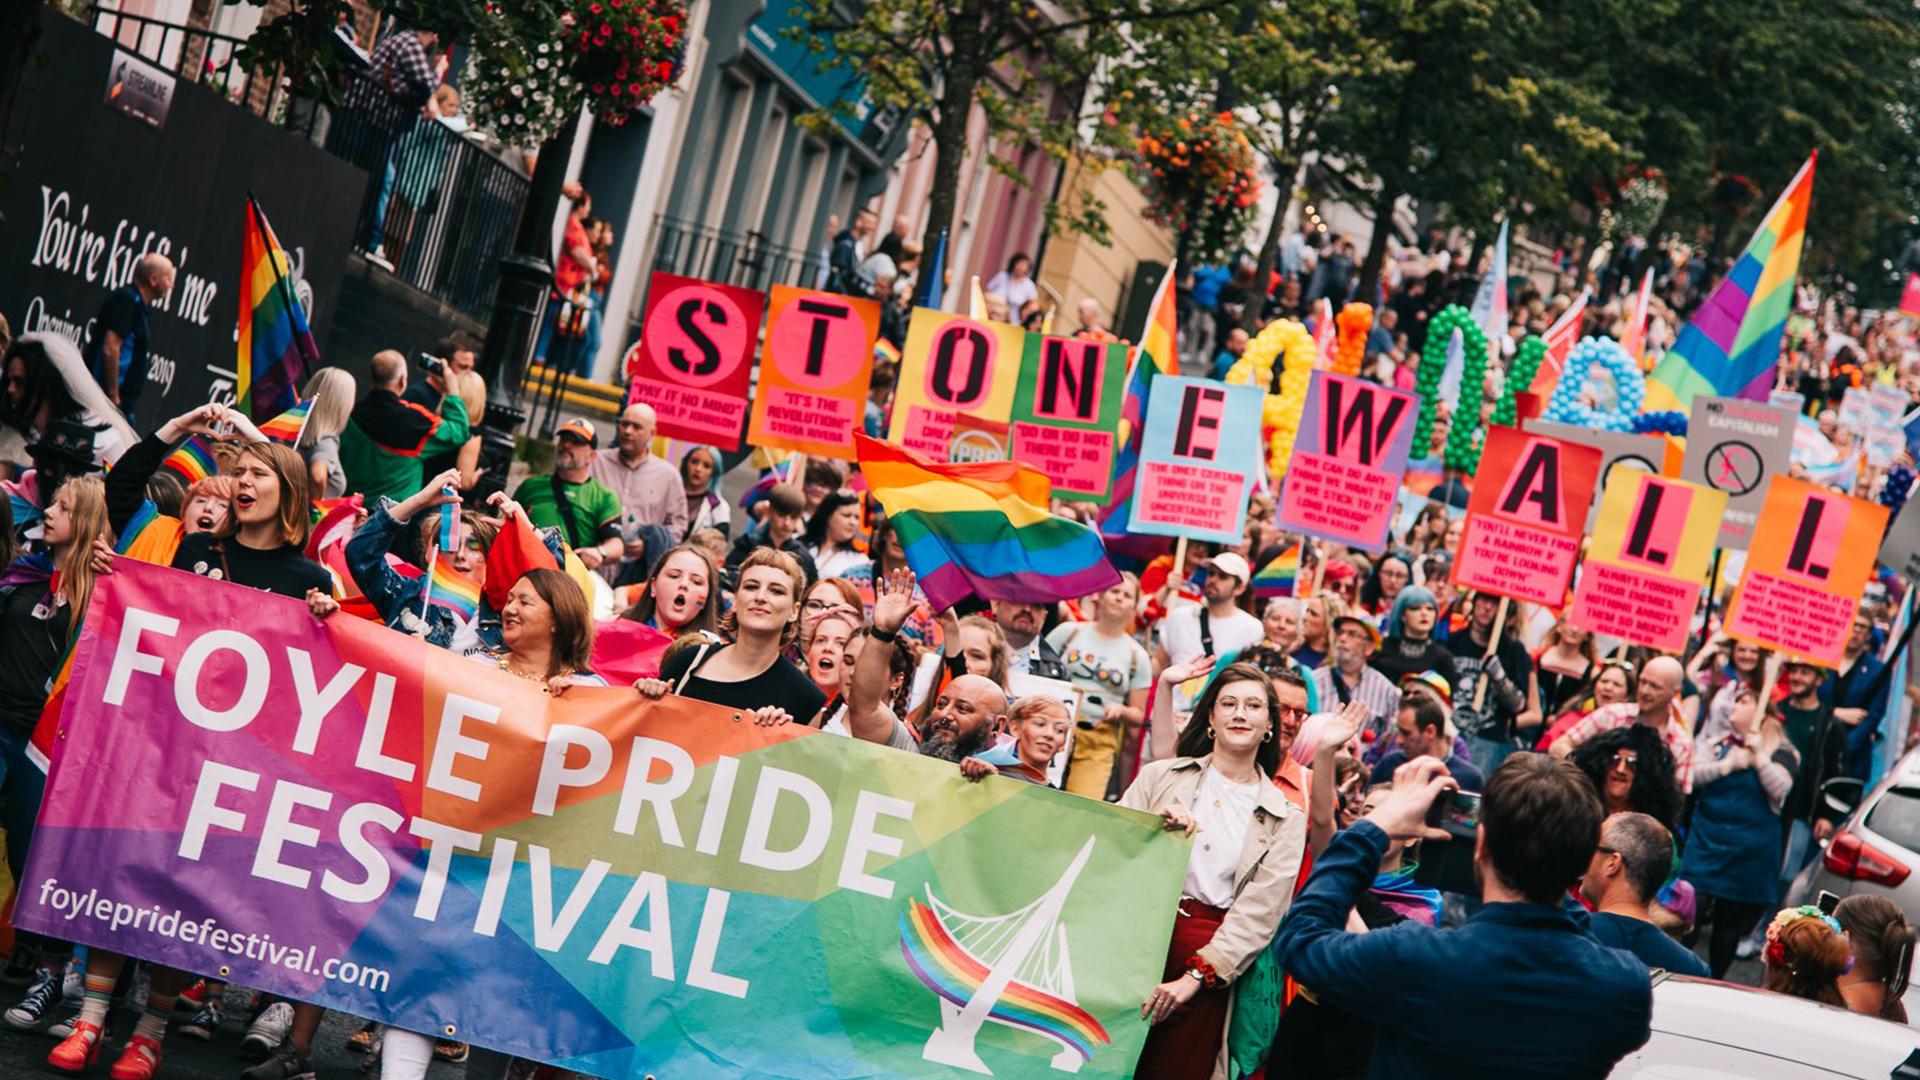 Foyle Pride 2019